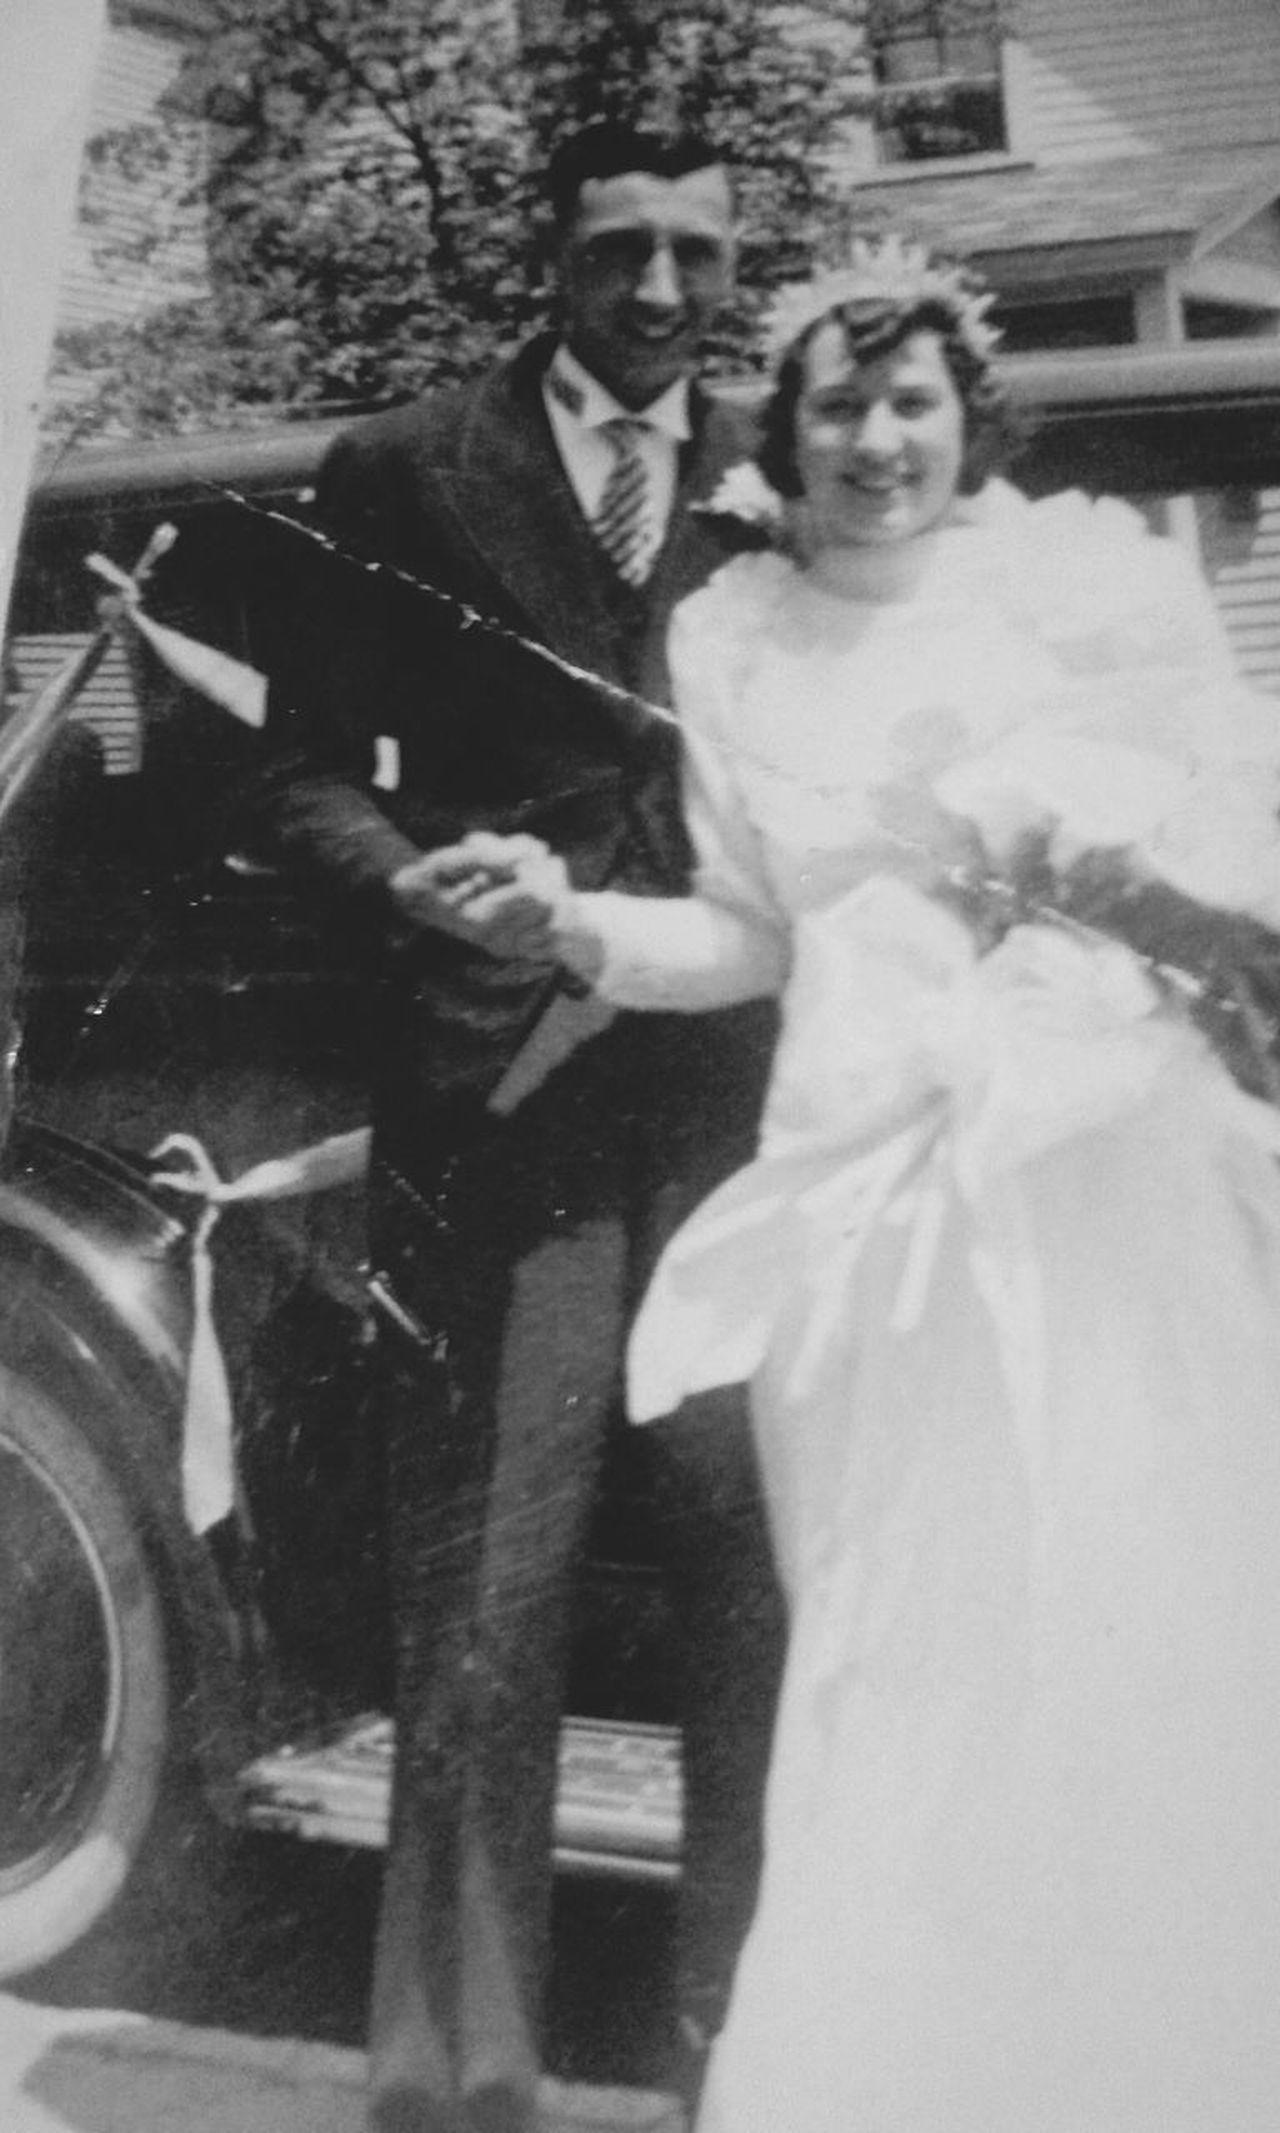 1930s Wedding Dress Wedding Bride Wife Two People Full Length Archival Real People People Husband Togetherness Enjoying Life Weddinginspiration Love❤